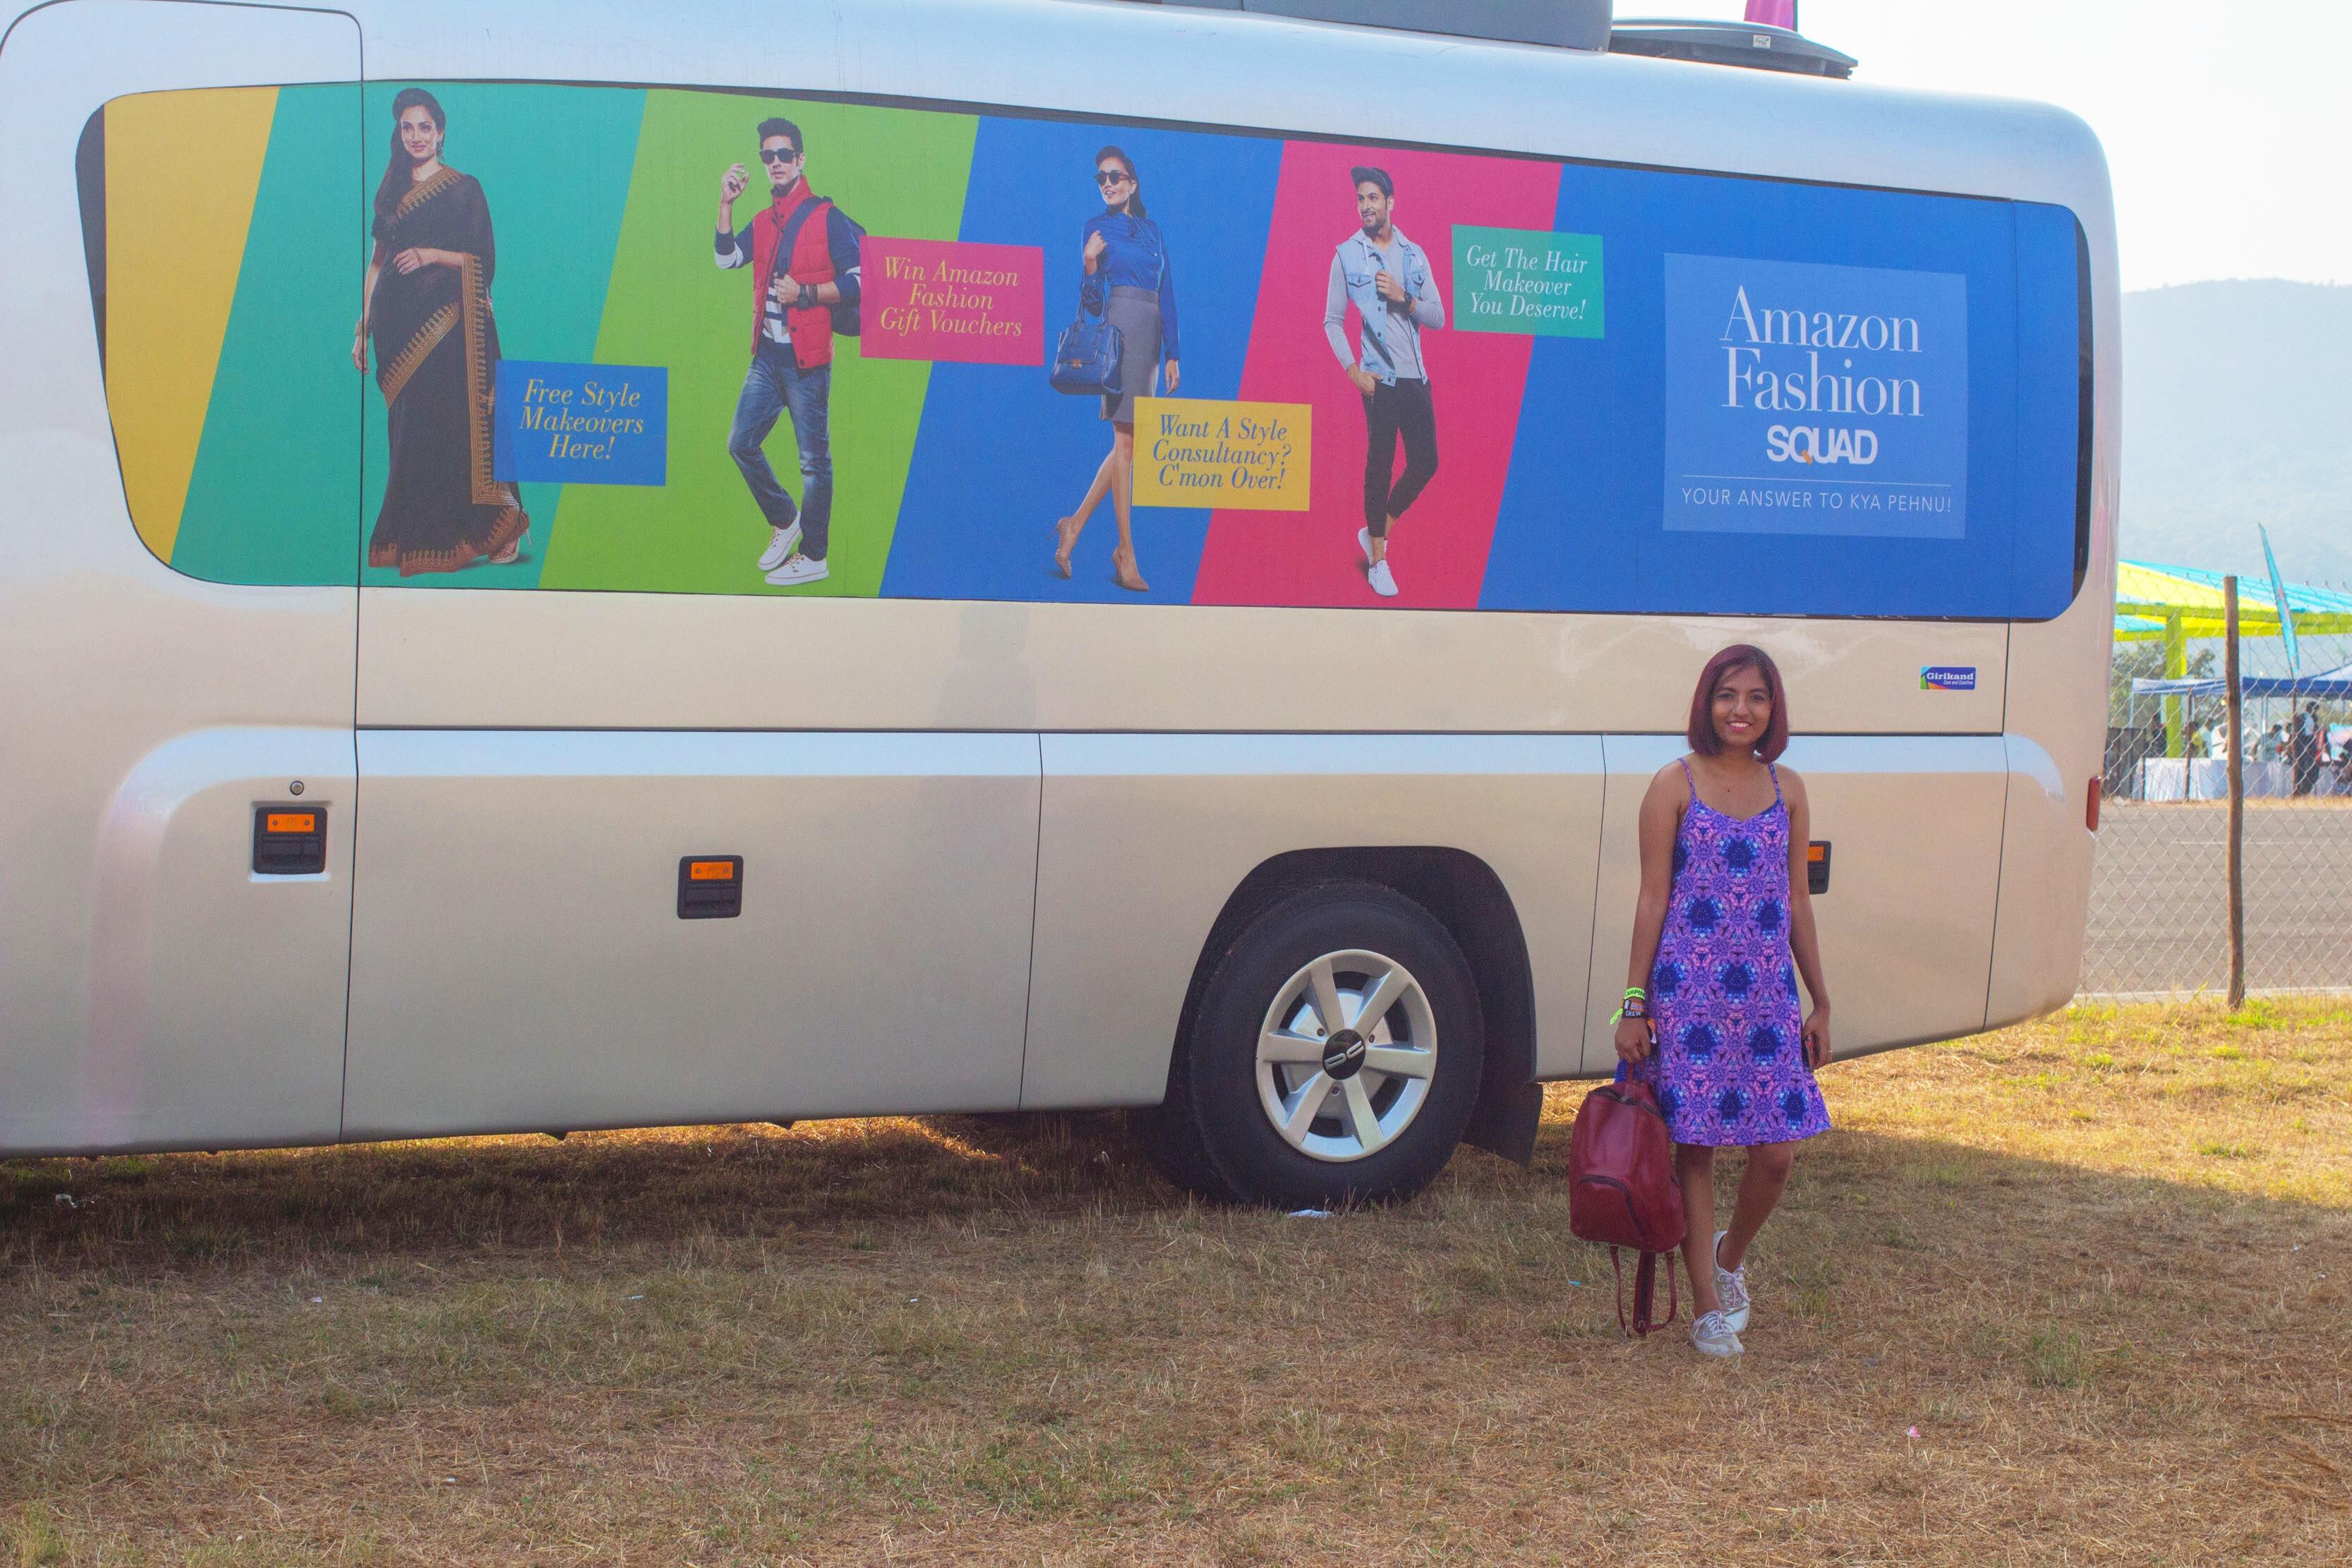 Amazon Fashion Squad Bus at EVC #kyapehnu